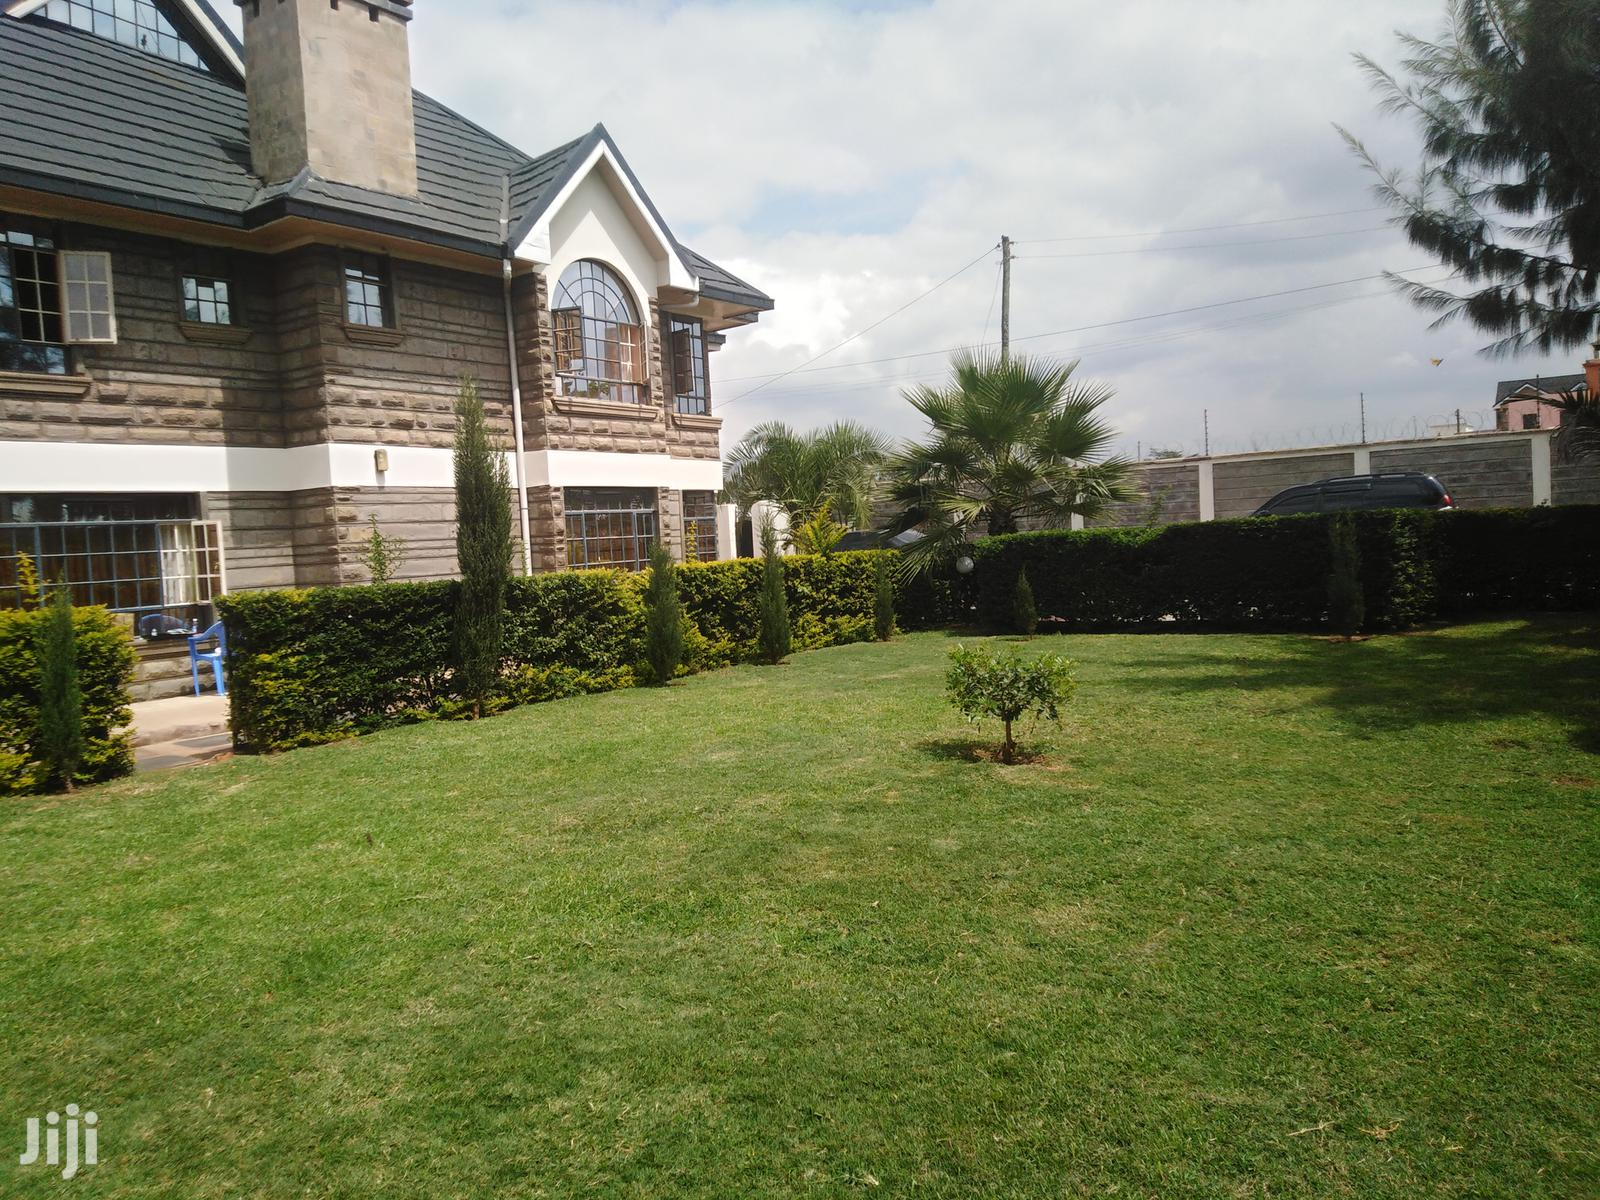 5 Bedroom House Sitting On 1/4 Acre For Sale In Ruiru Bypass | Houses & Apartments For Sale for sale in Nairobi Central, Nairobi, Kenya